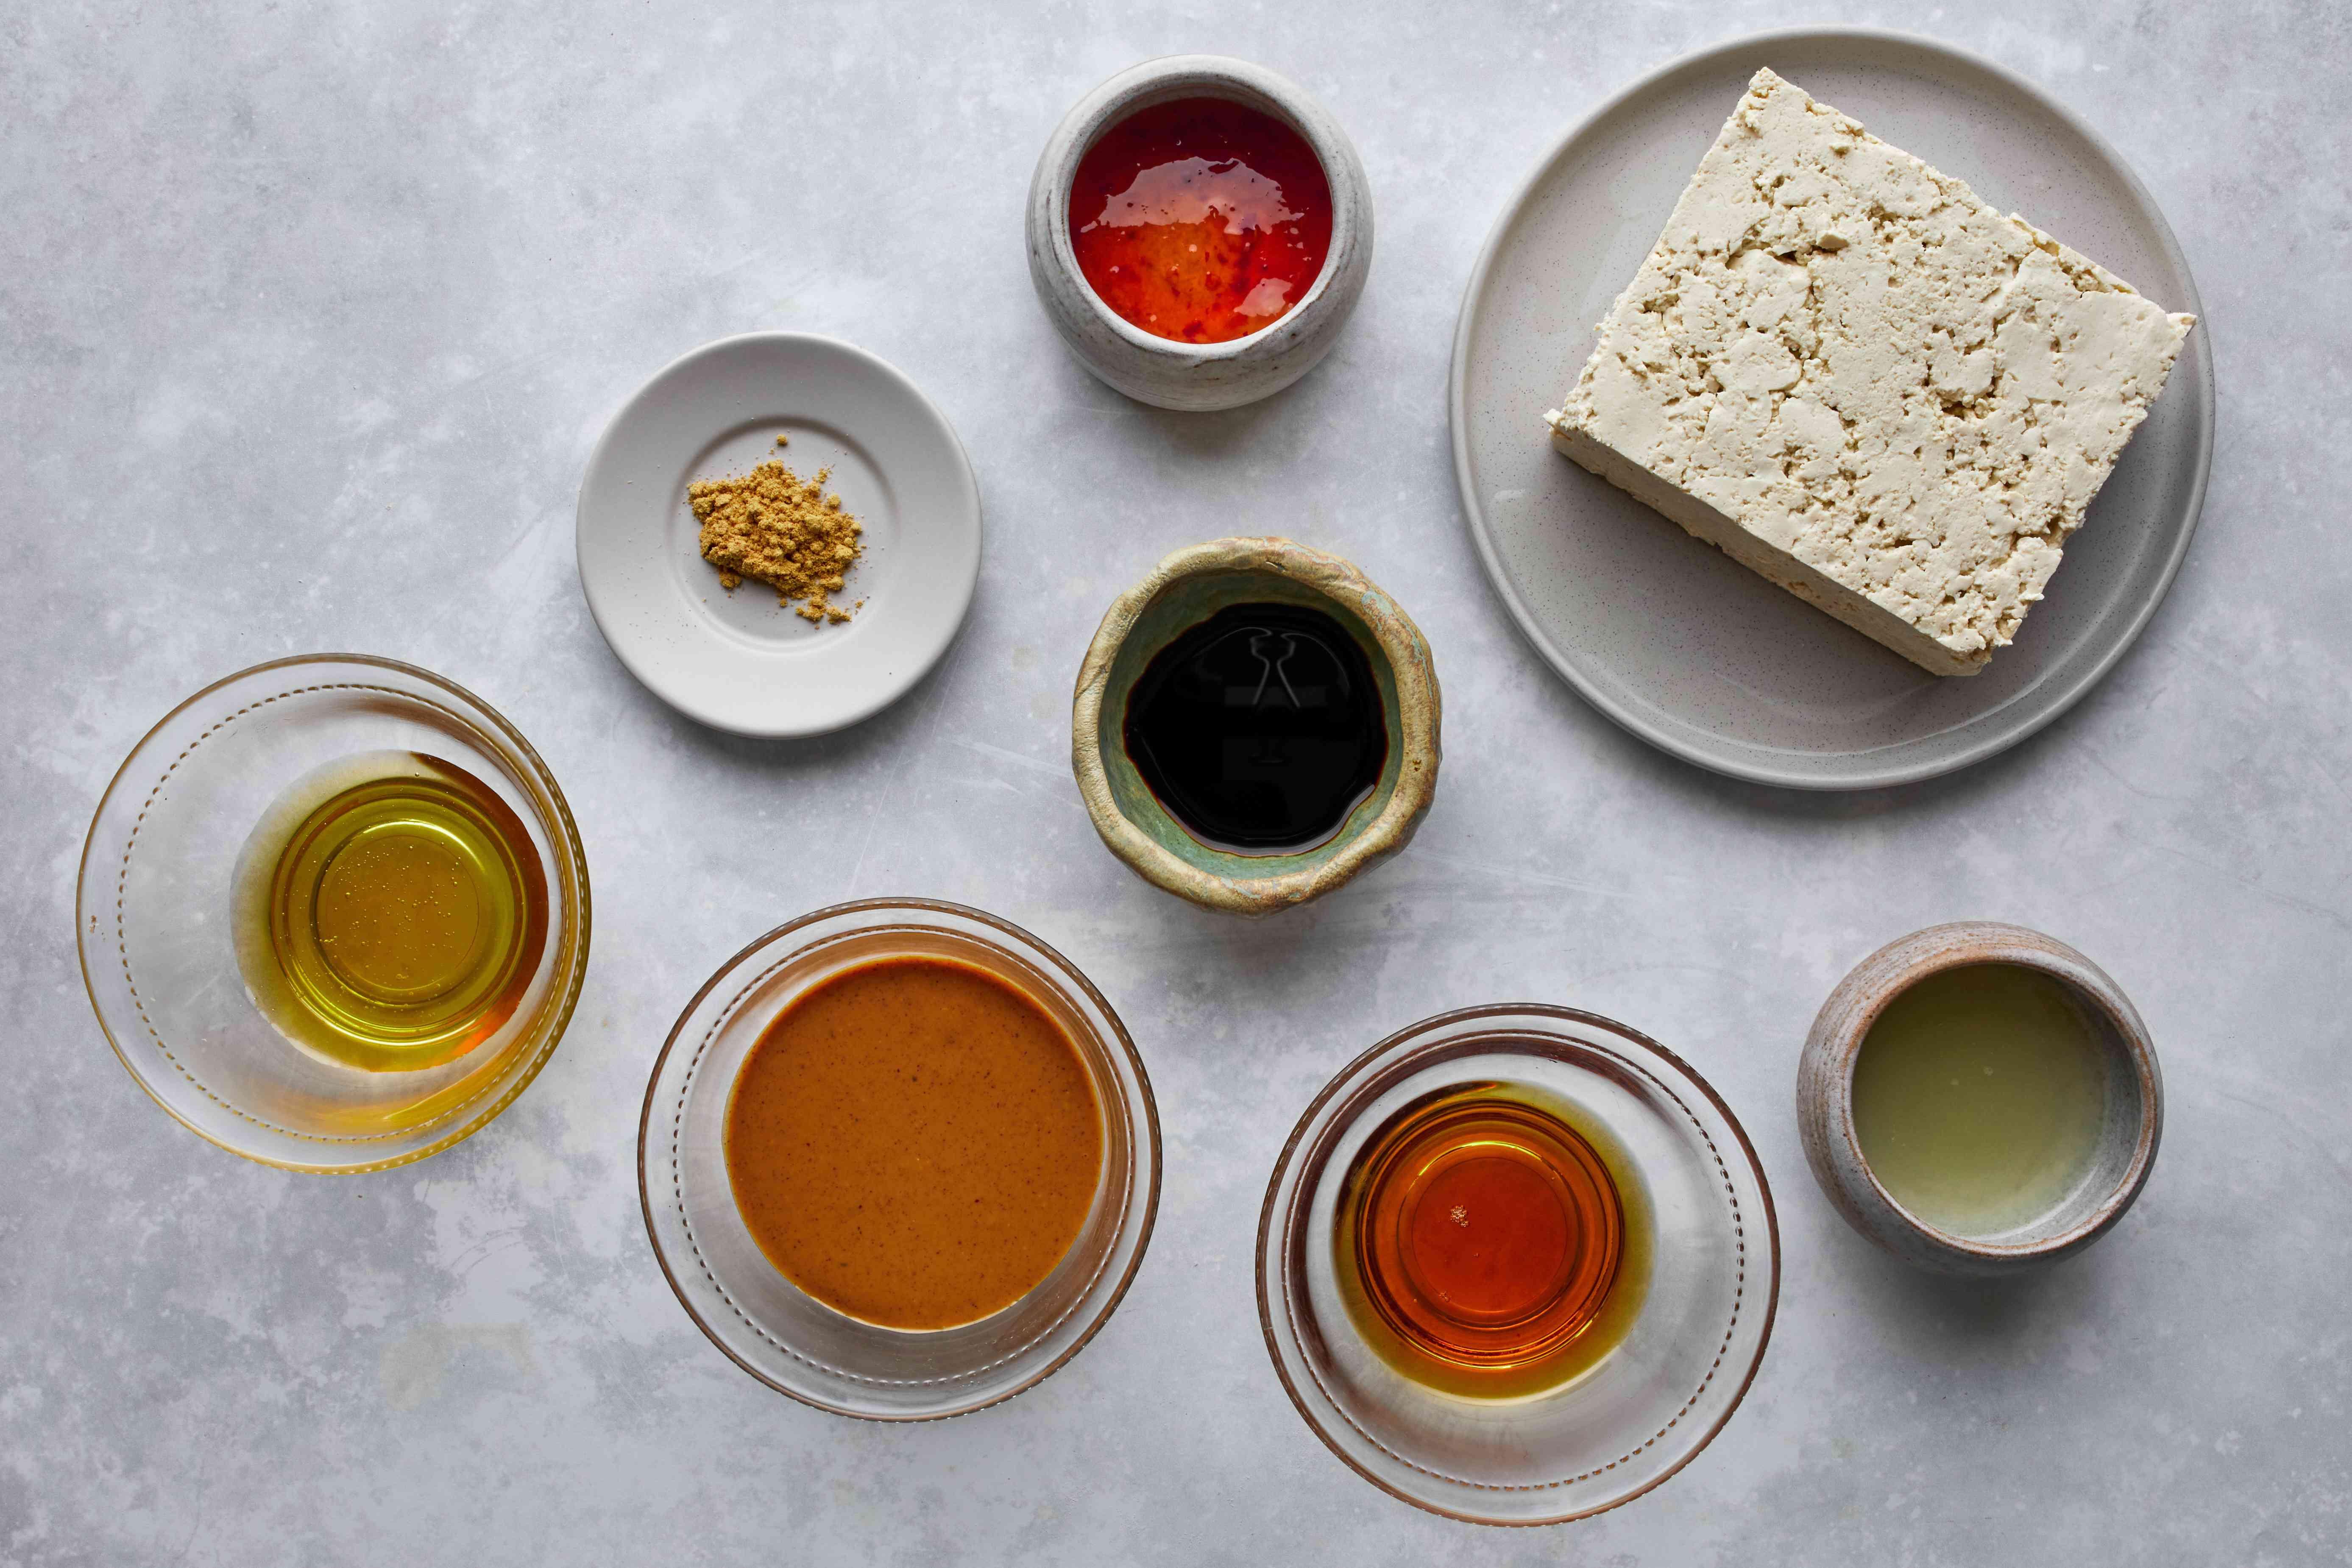 Ingredients for Baked Tofu in Thai Peanut Sauce recipe